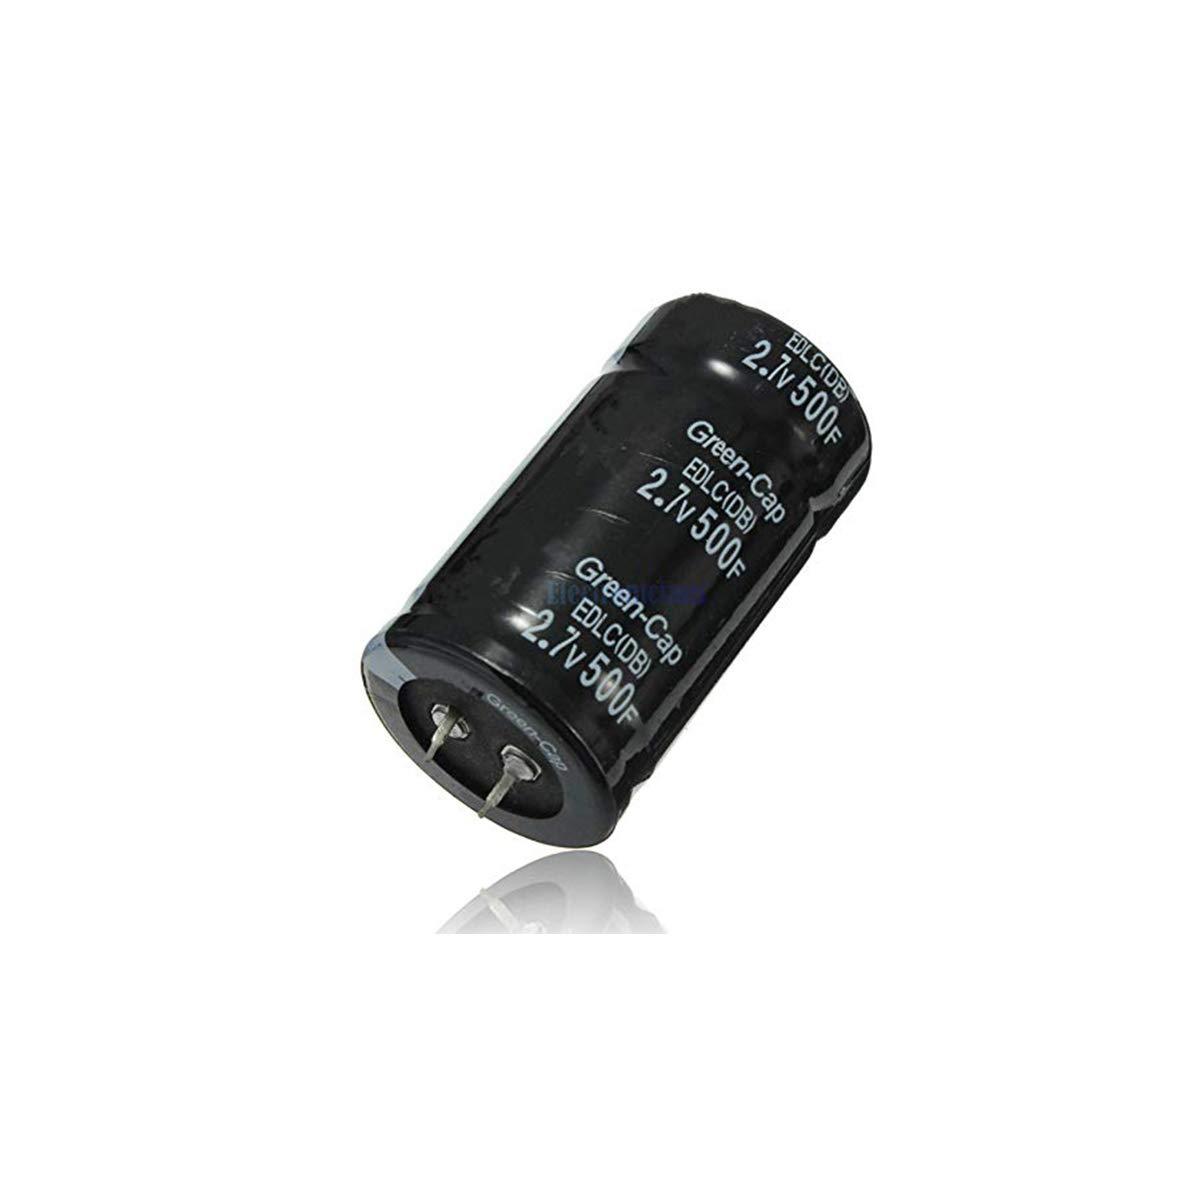 Super Capacitor Drops Automobile Capacitor Through General Orifice 2Pcs 2.7V 500F Capacitor Farad Capacitor 35mm 60mm